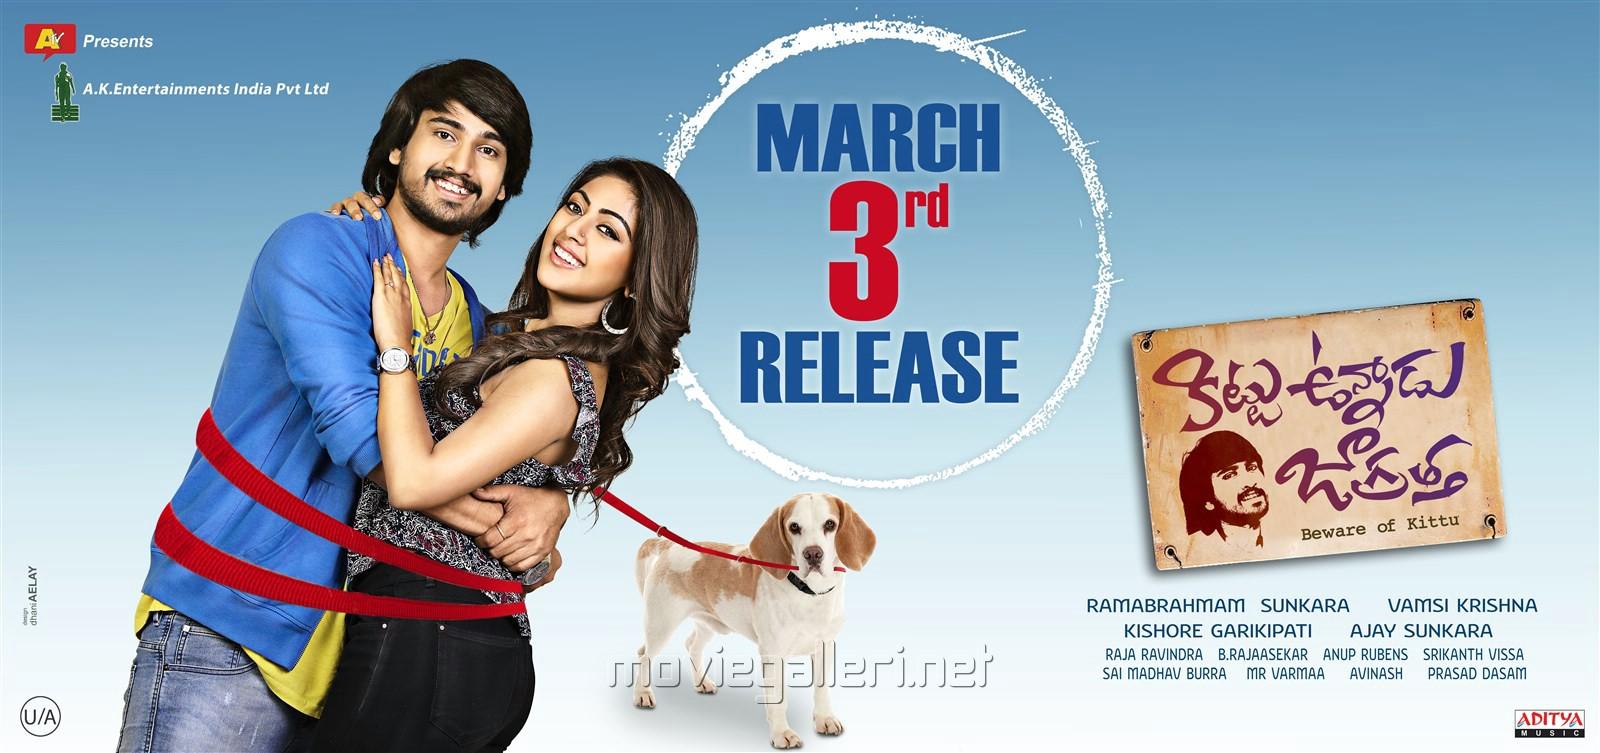 Raj Tarun & Anu Emmanuel in Kittu Unnadu Jagratha Movie Release Date March 3rd Wallpapers